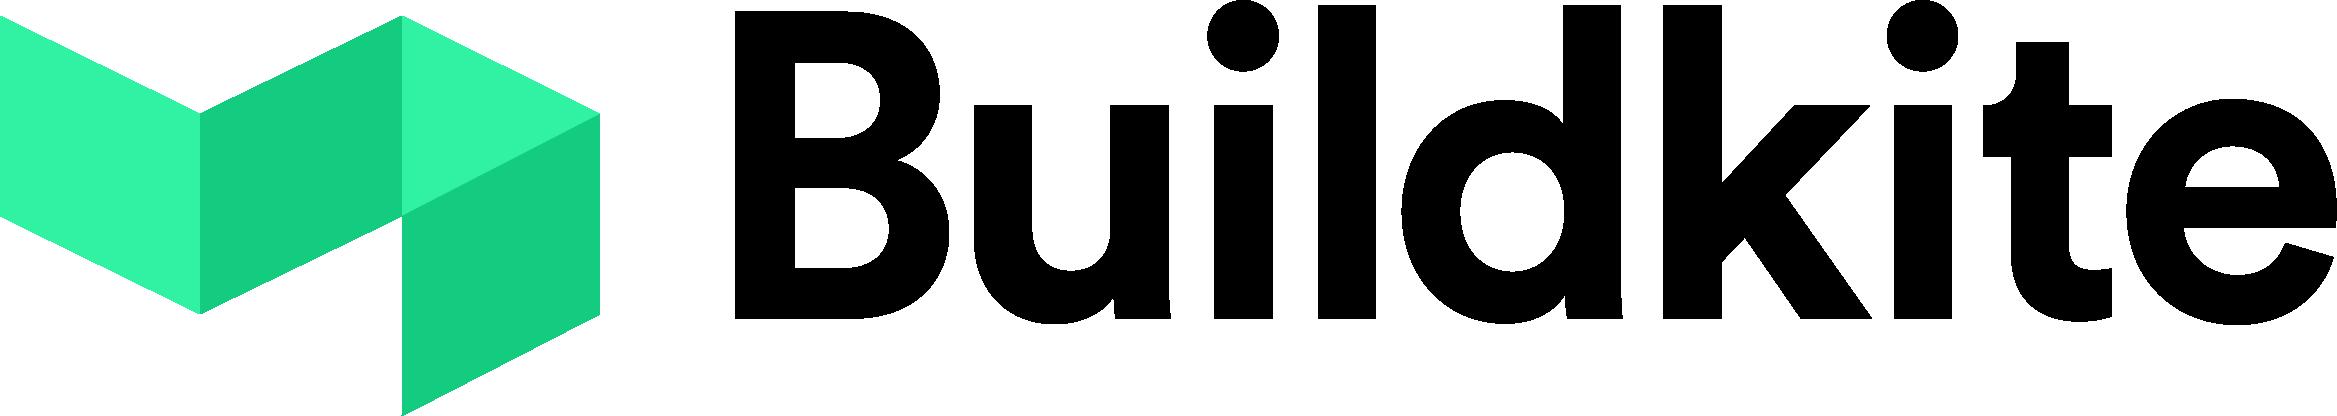 buildkite-indieconf